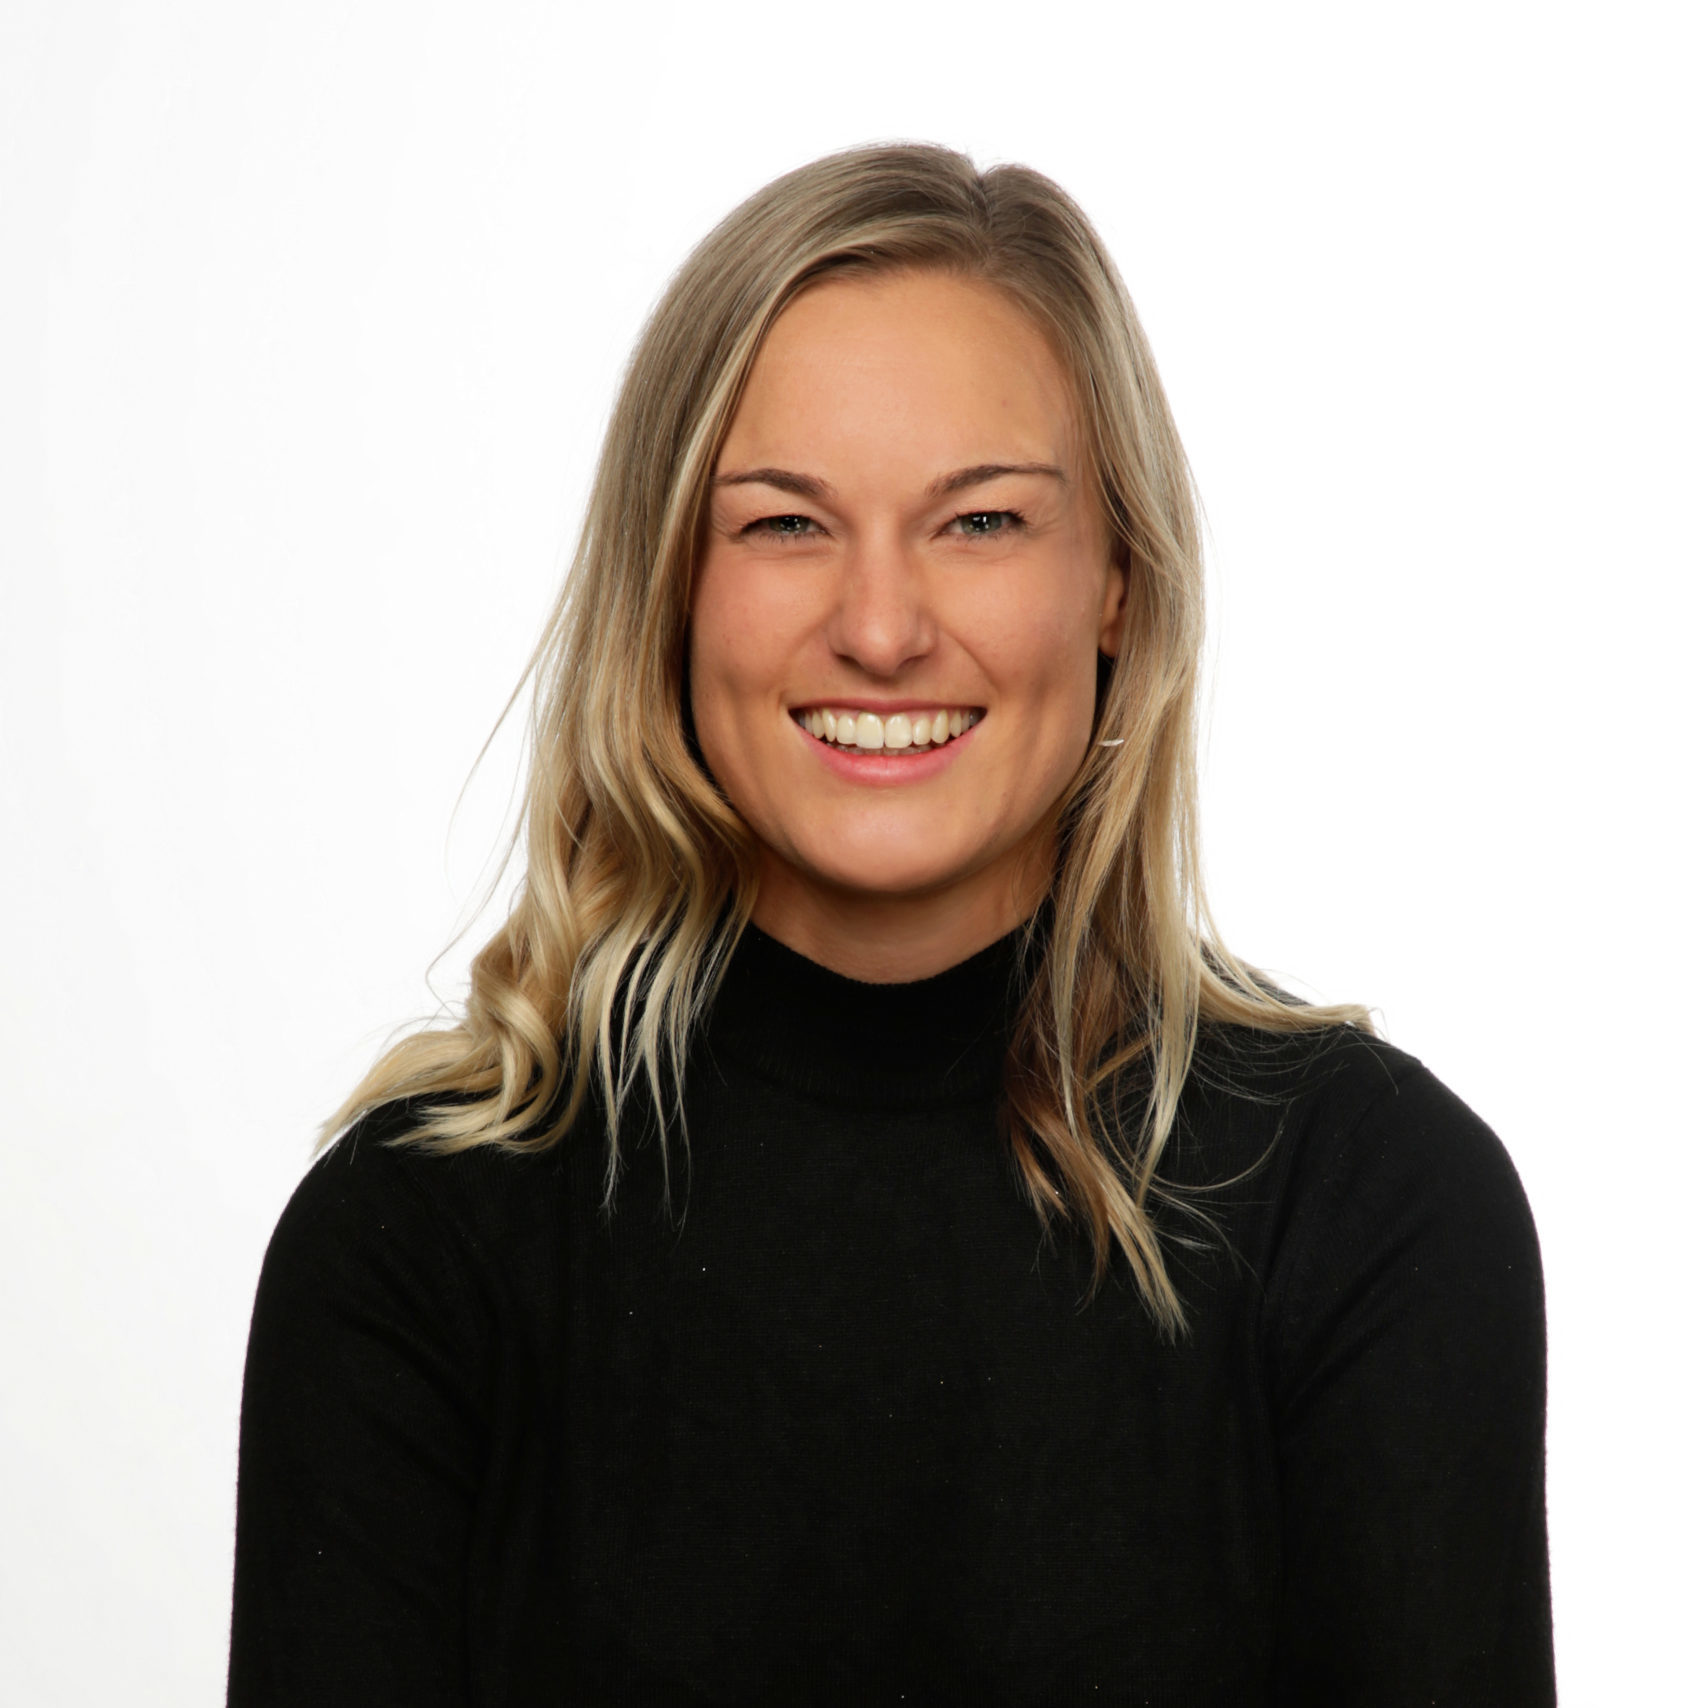 Stefanie Biberger